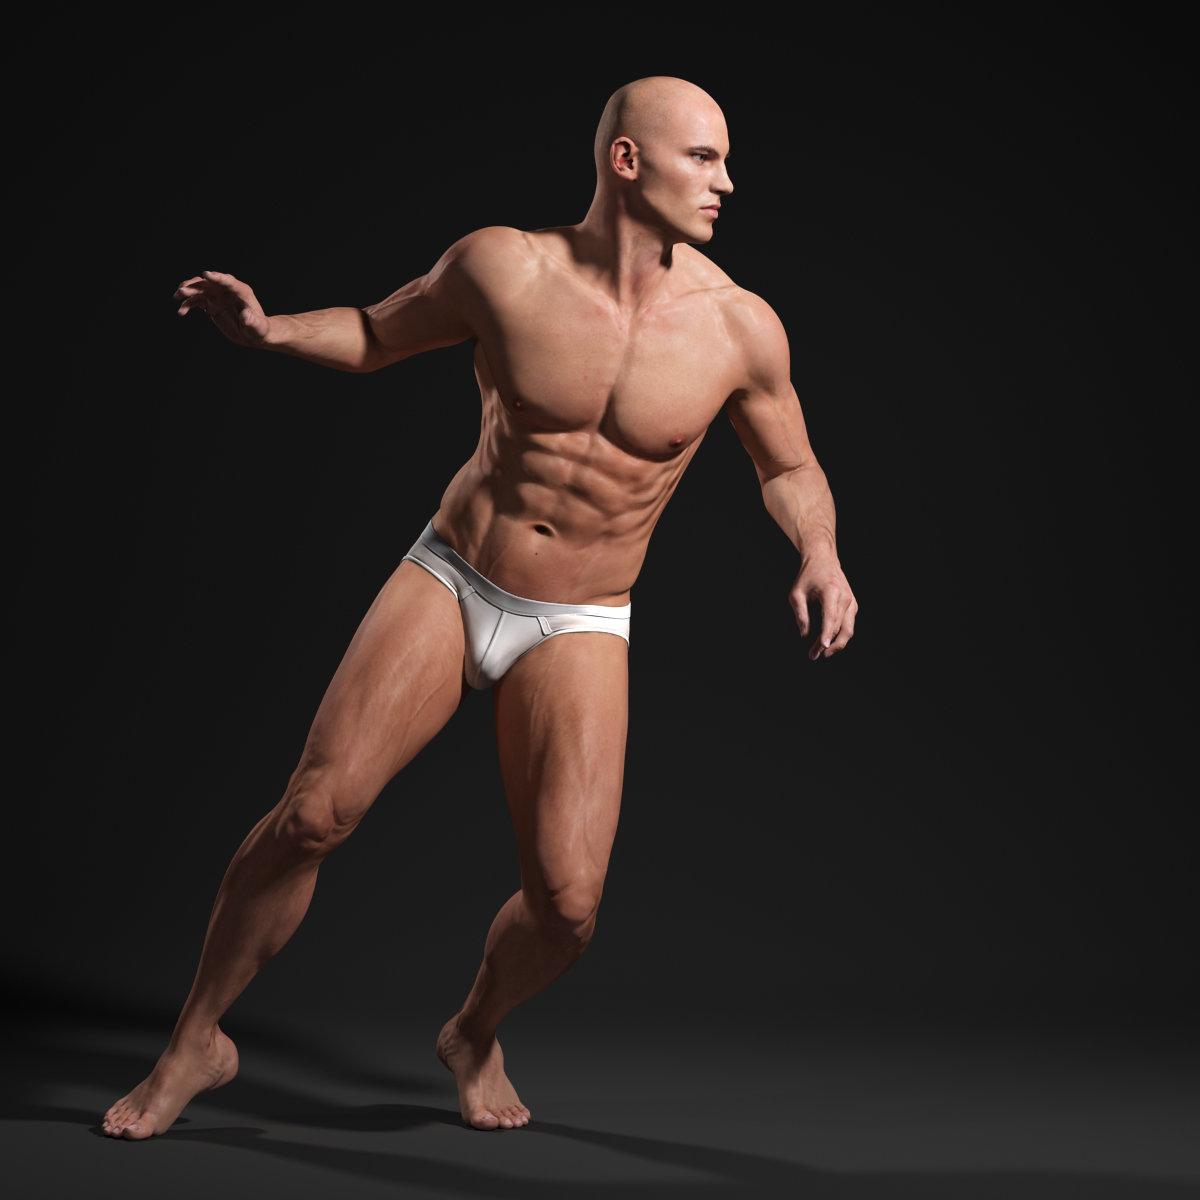 ArtStation - Male Body - Anatomy Study, Andor Kollar